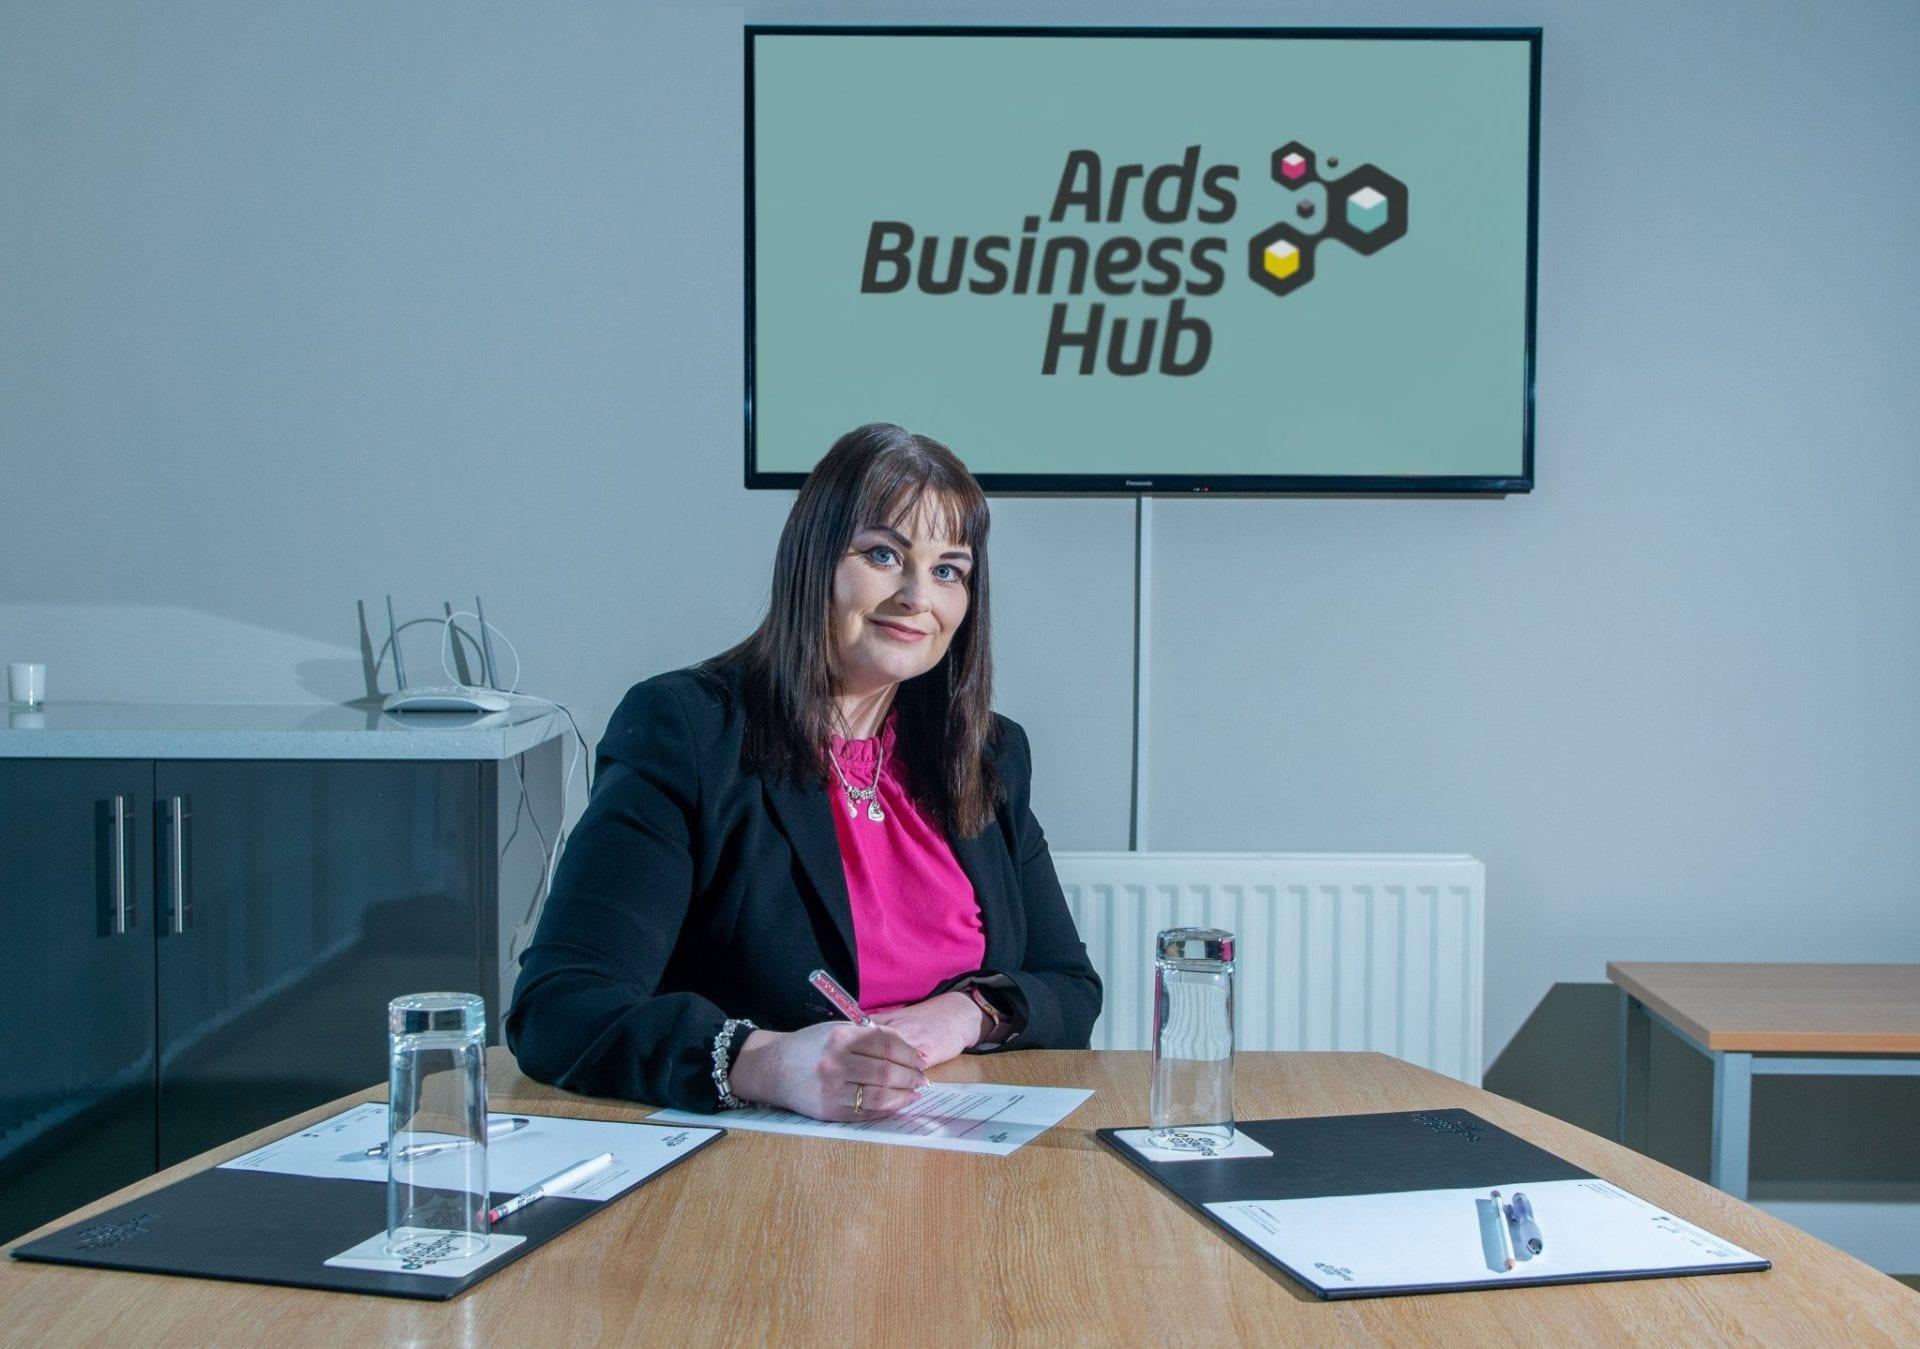 Ards Business Hub